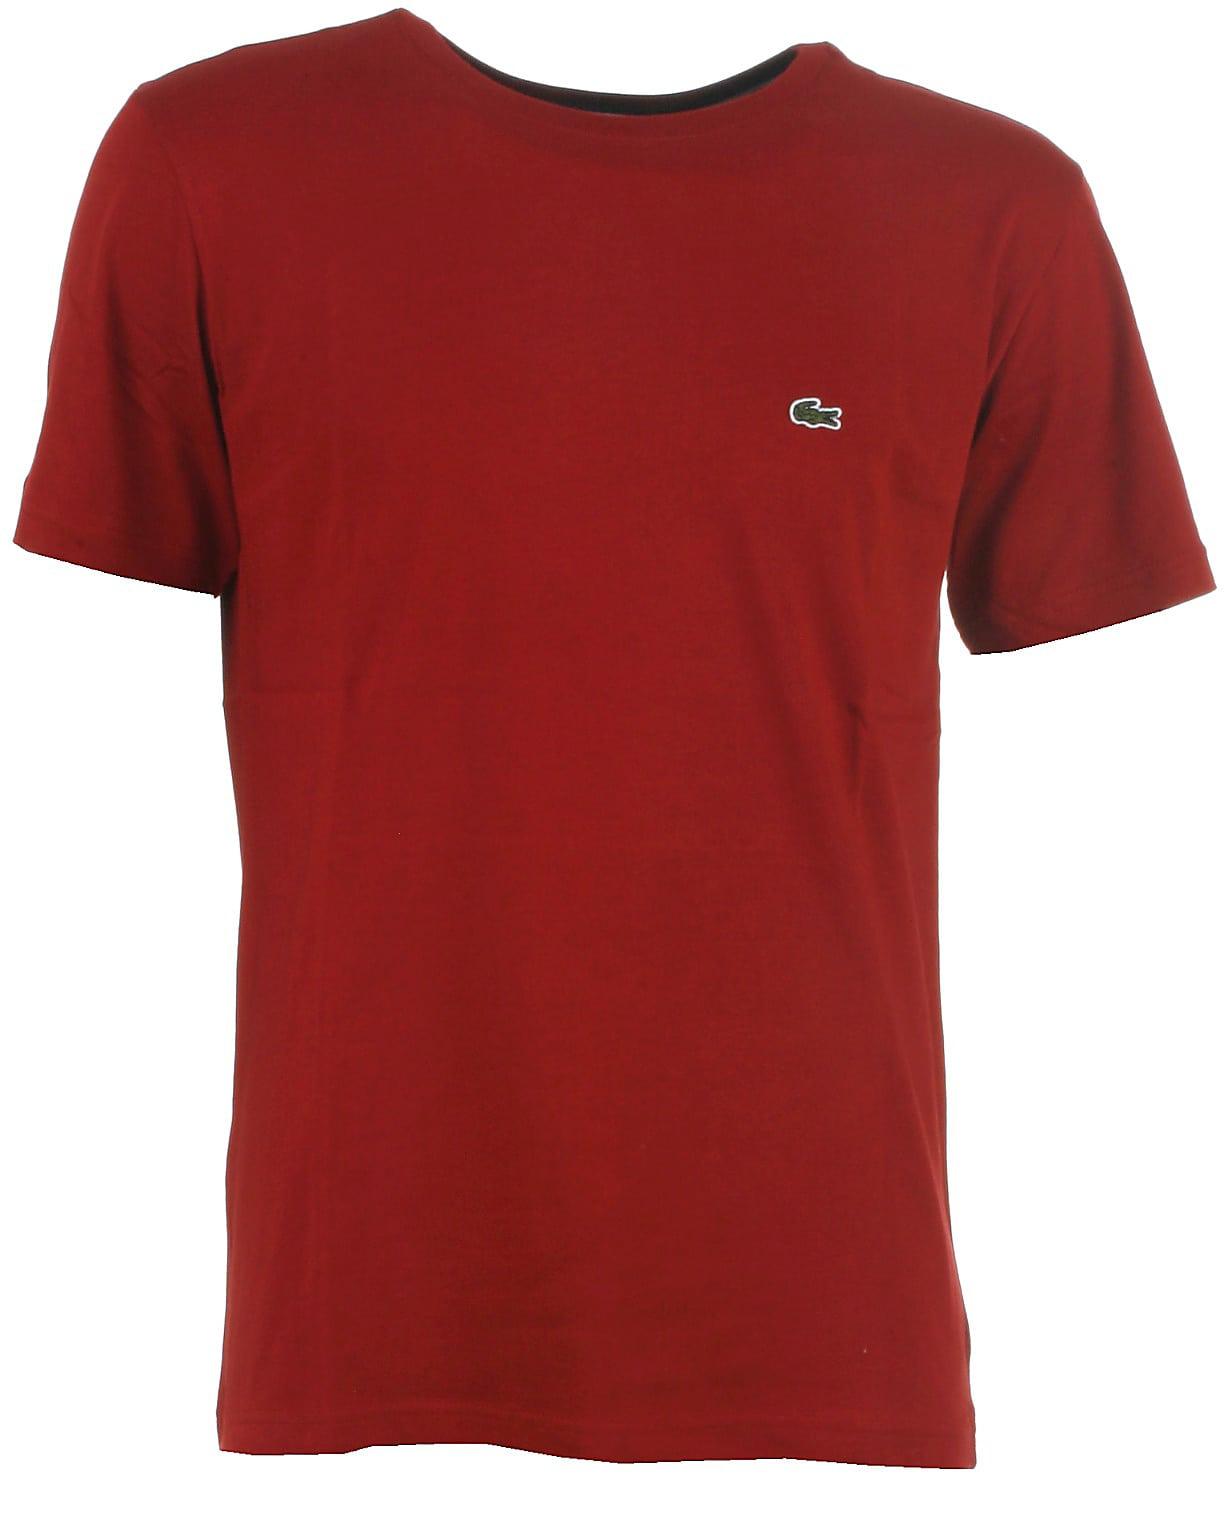 Lacoste t-shirt s/s, vinrød